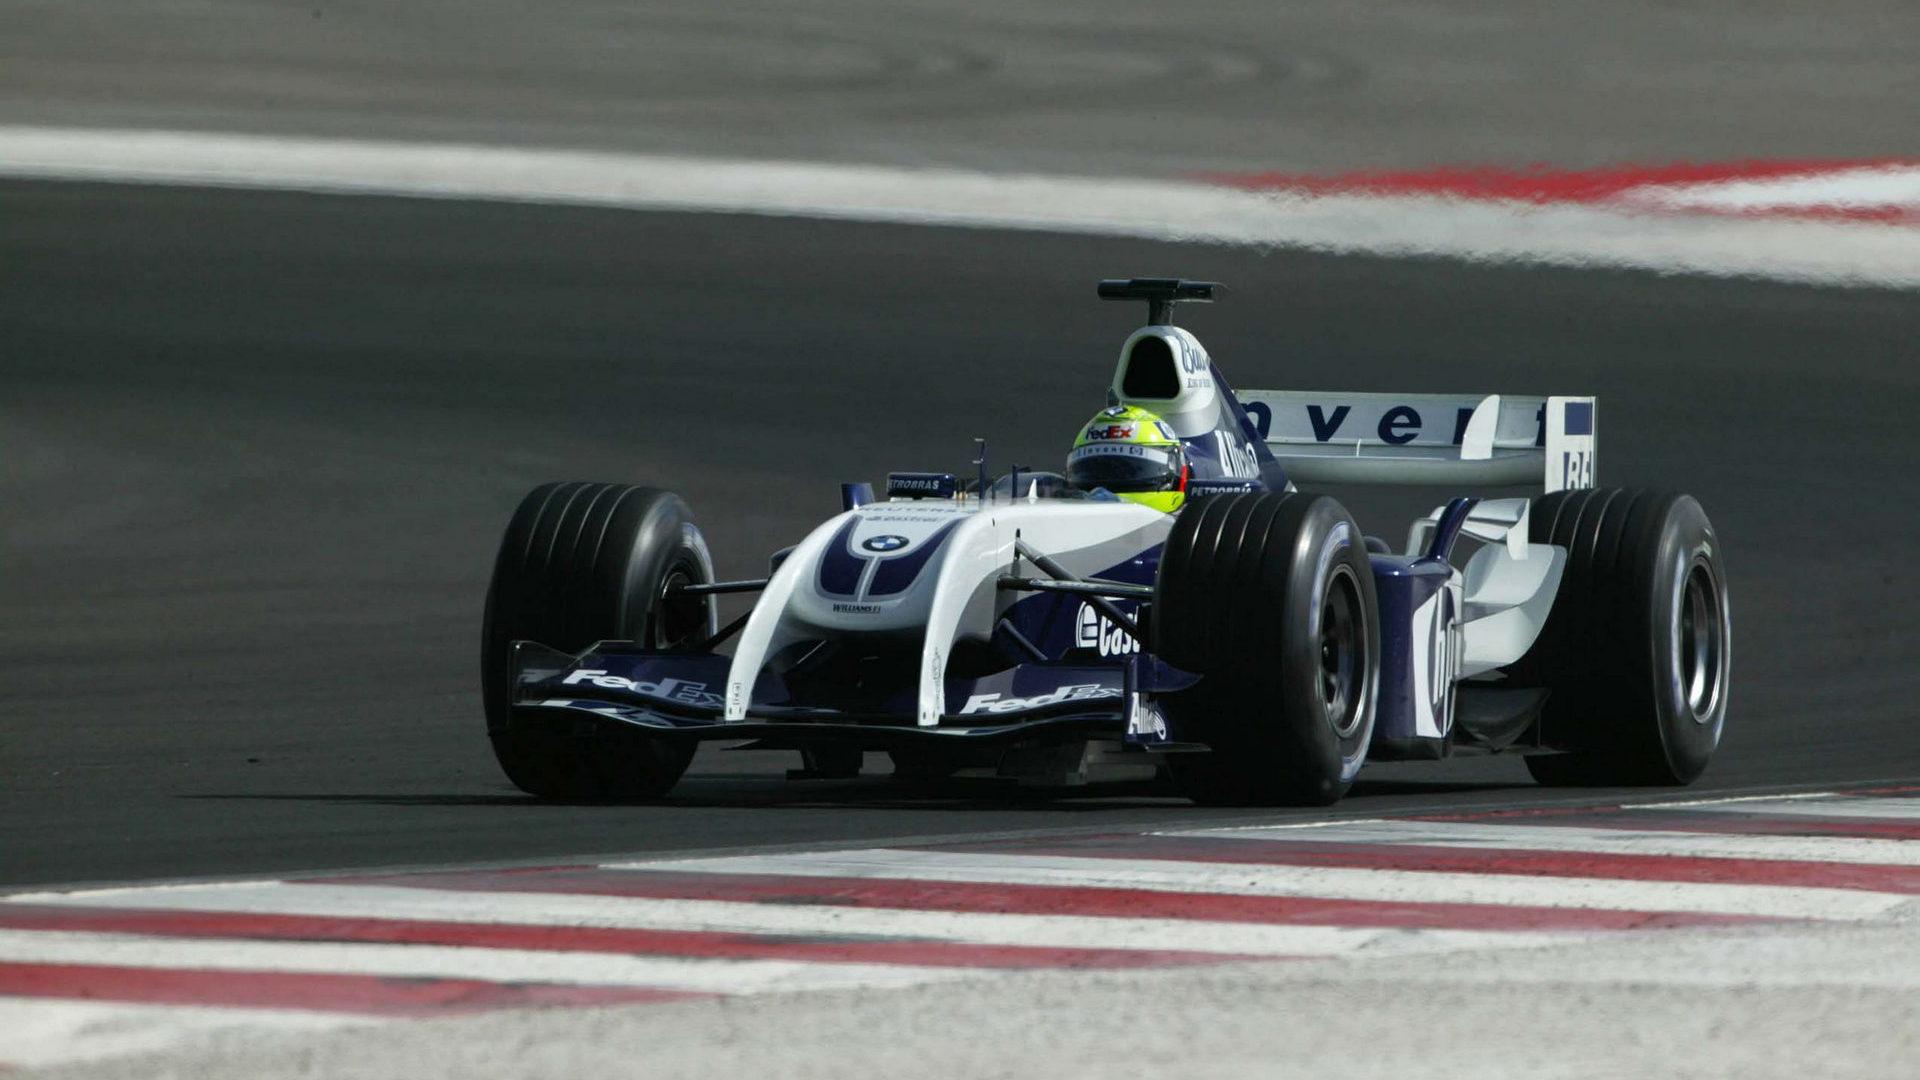 HD Wallpapers 2004 Formula 1 Grand Prix of Bahrain  F1